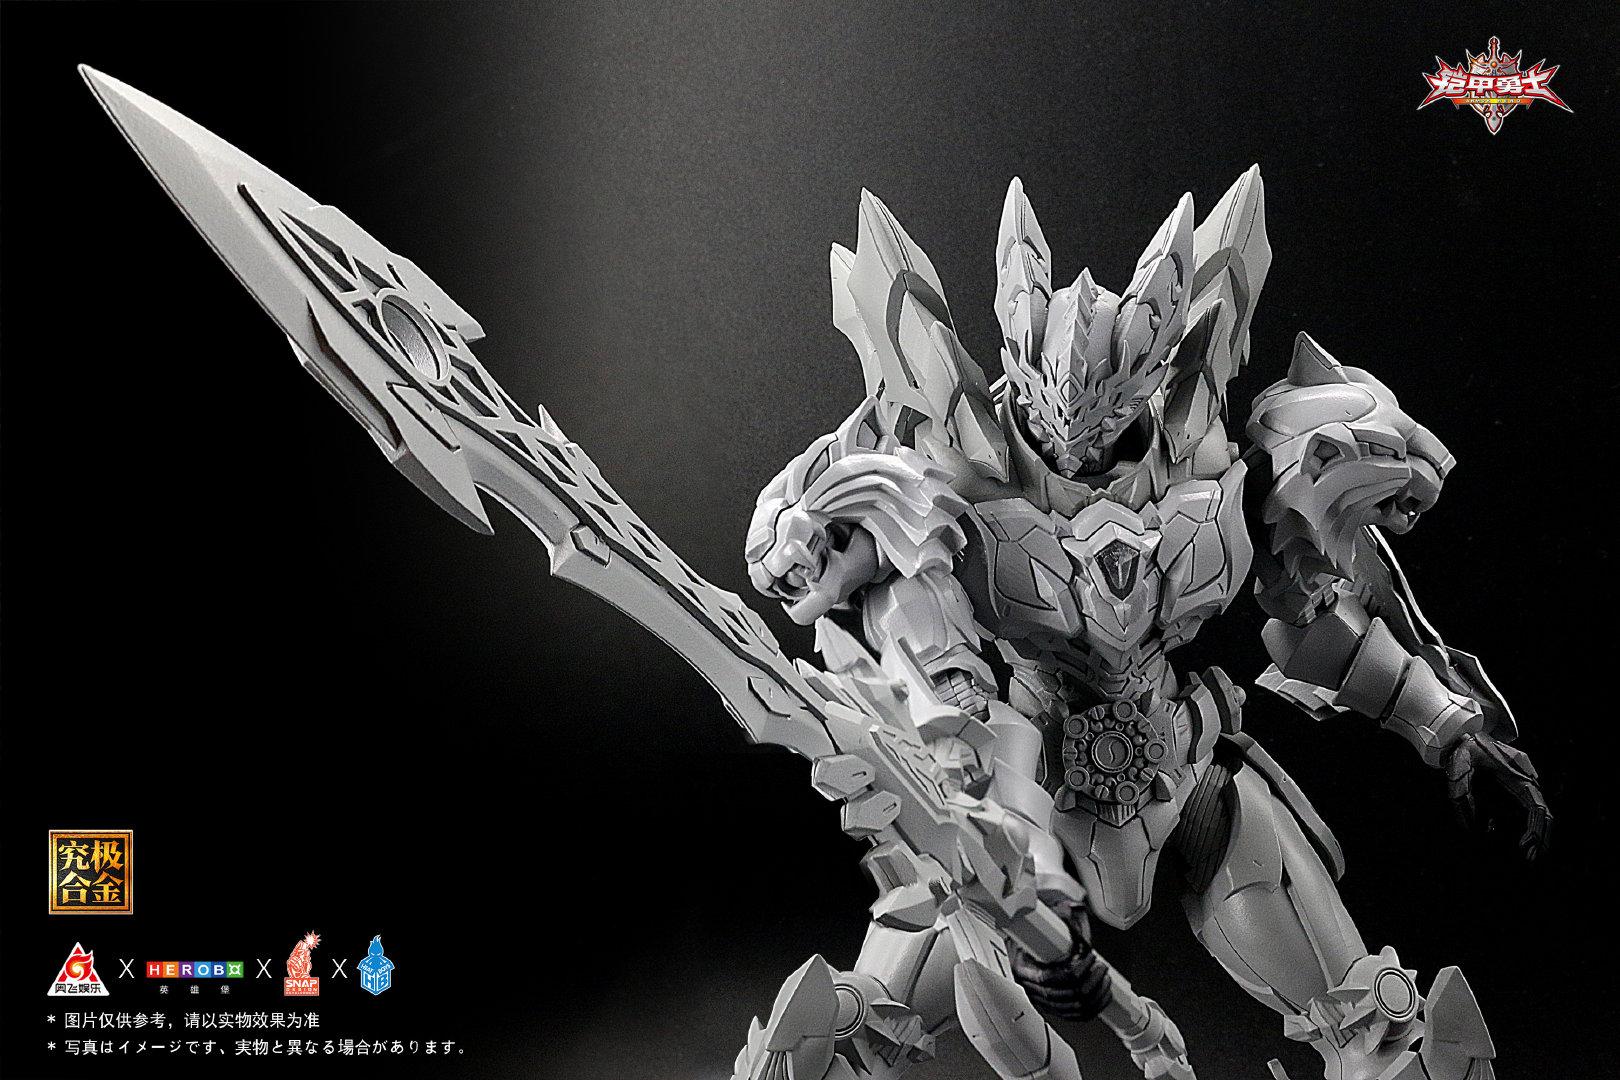 S535_Armor_hero_Emperor_020.jpg